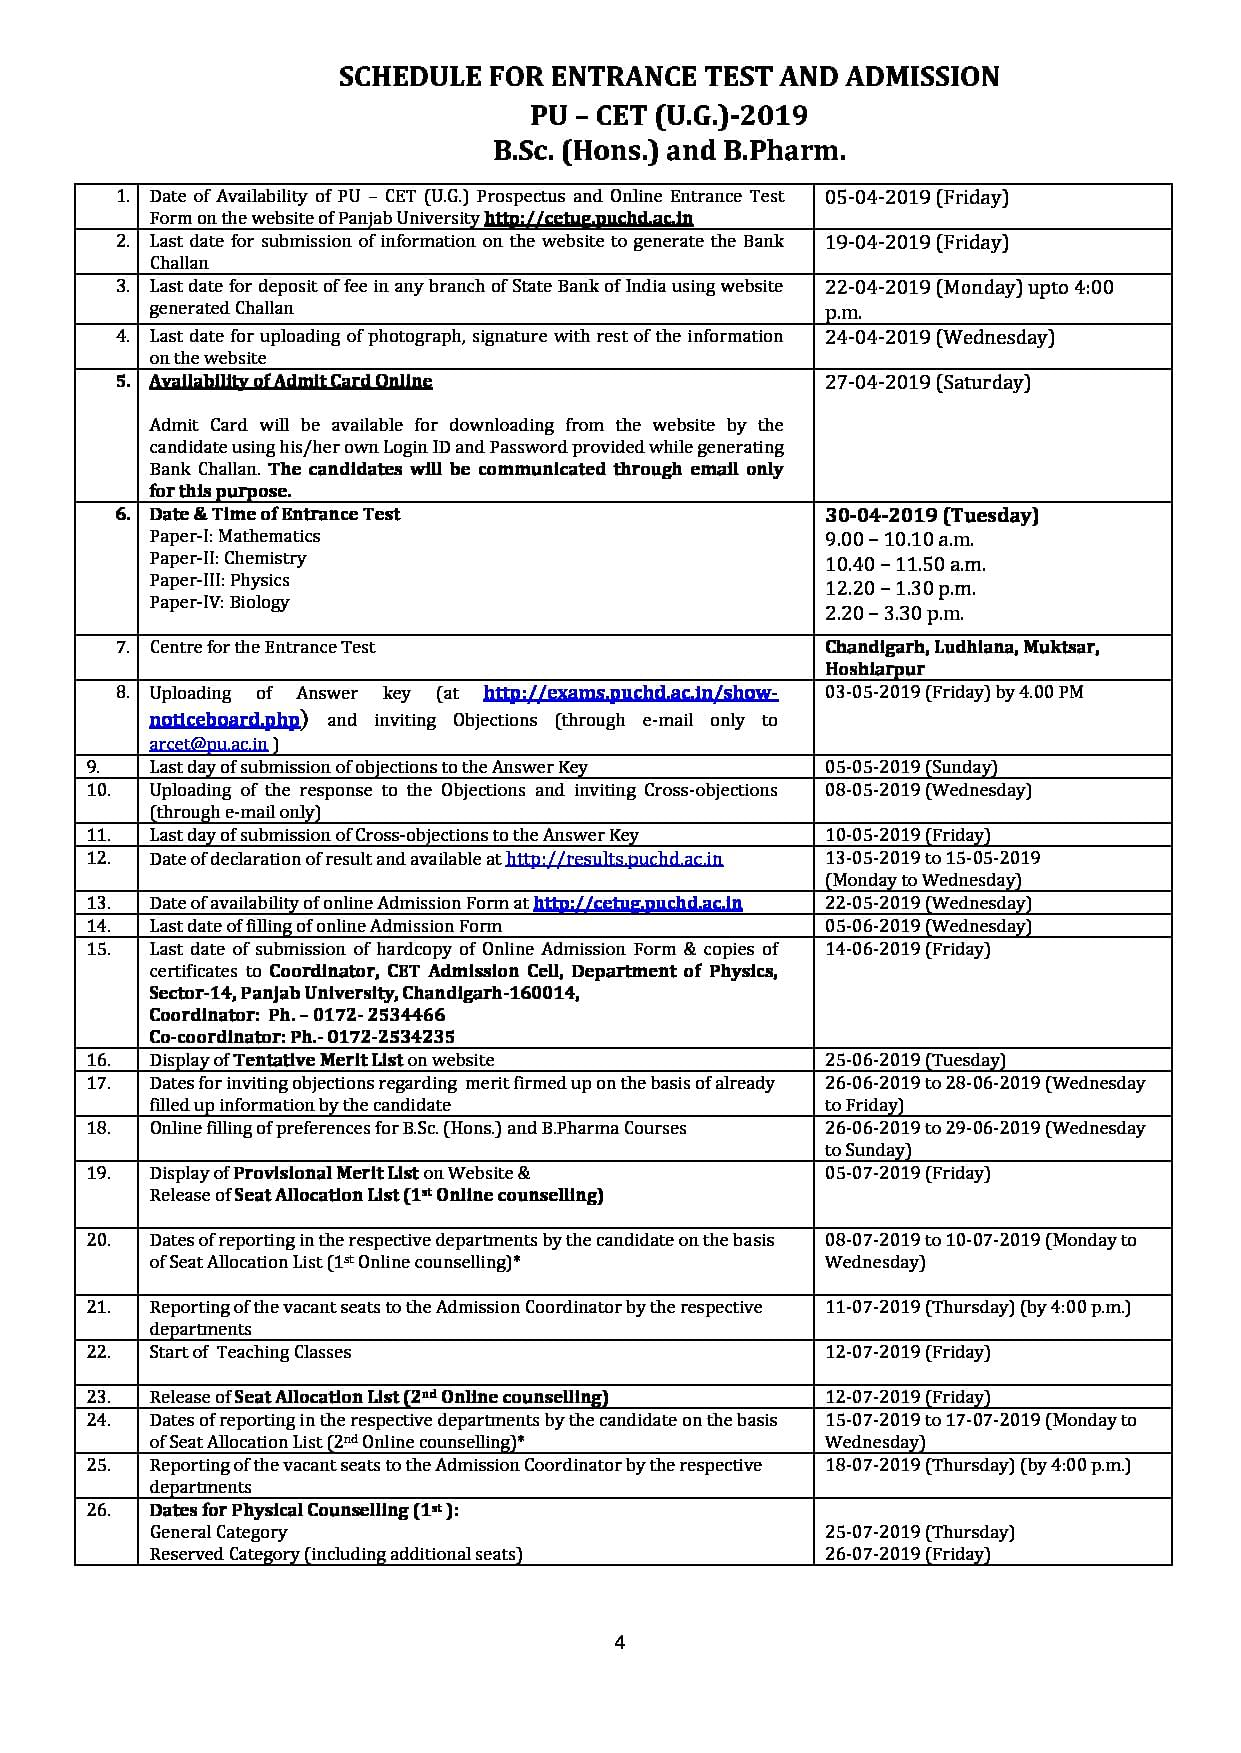 Panjab University (PU), Chandigarh - Course, Fees, Admission